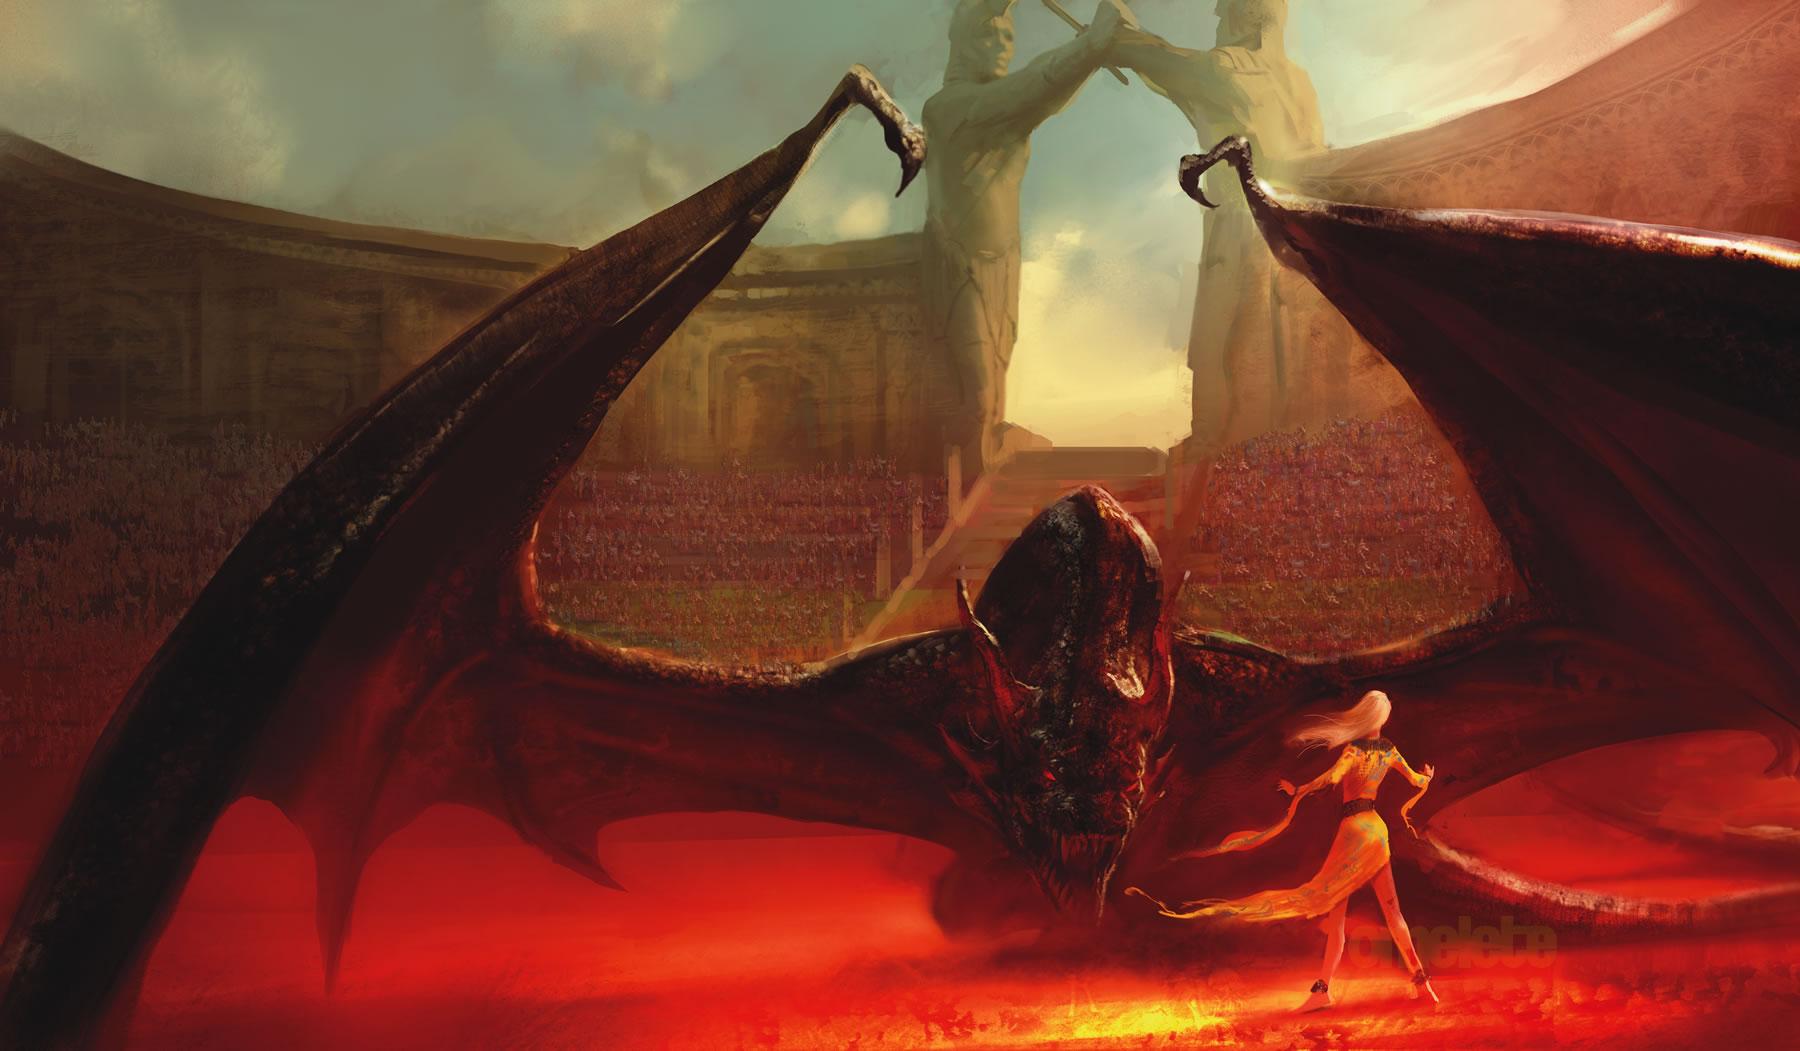 A dance with dragons brazilian cover art.jpg